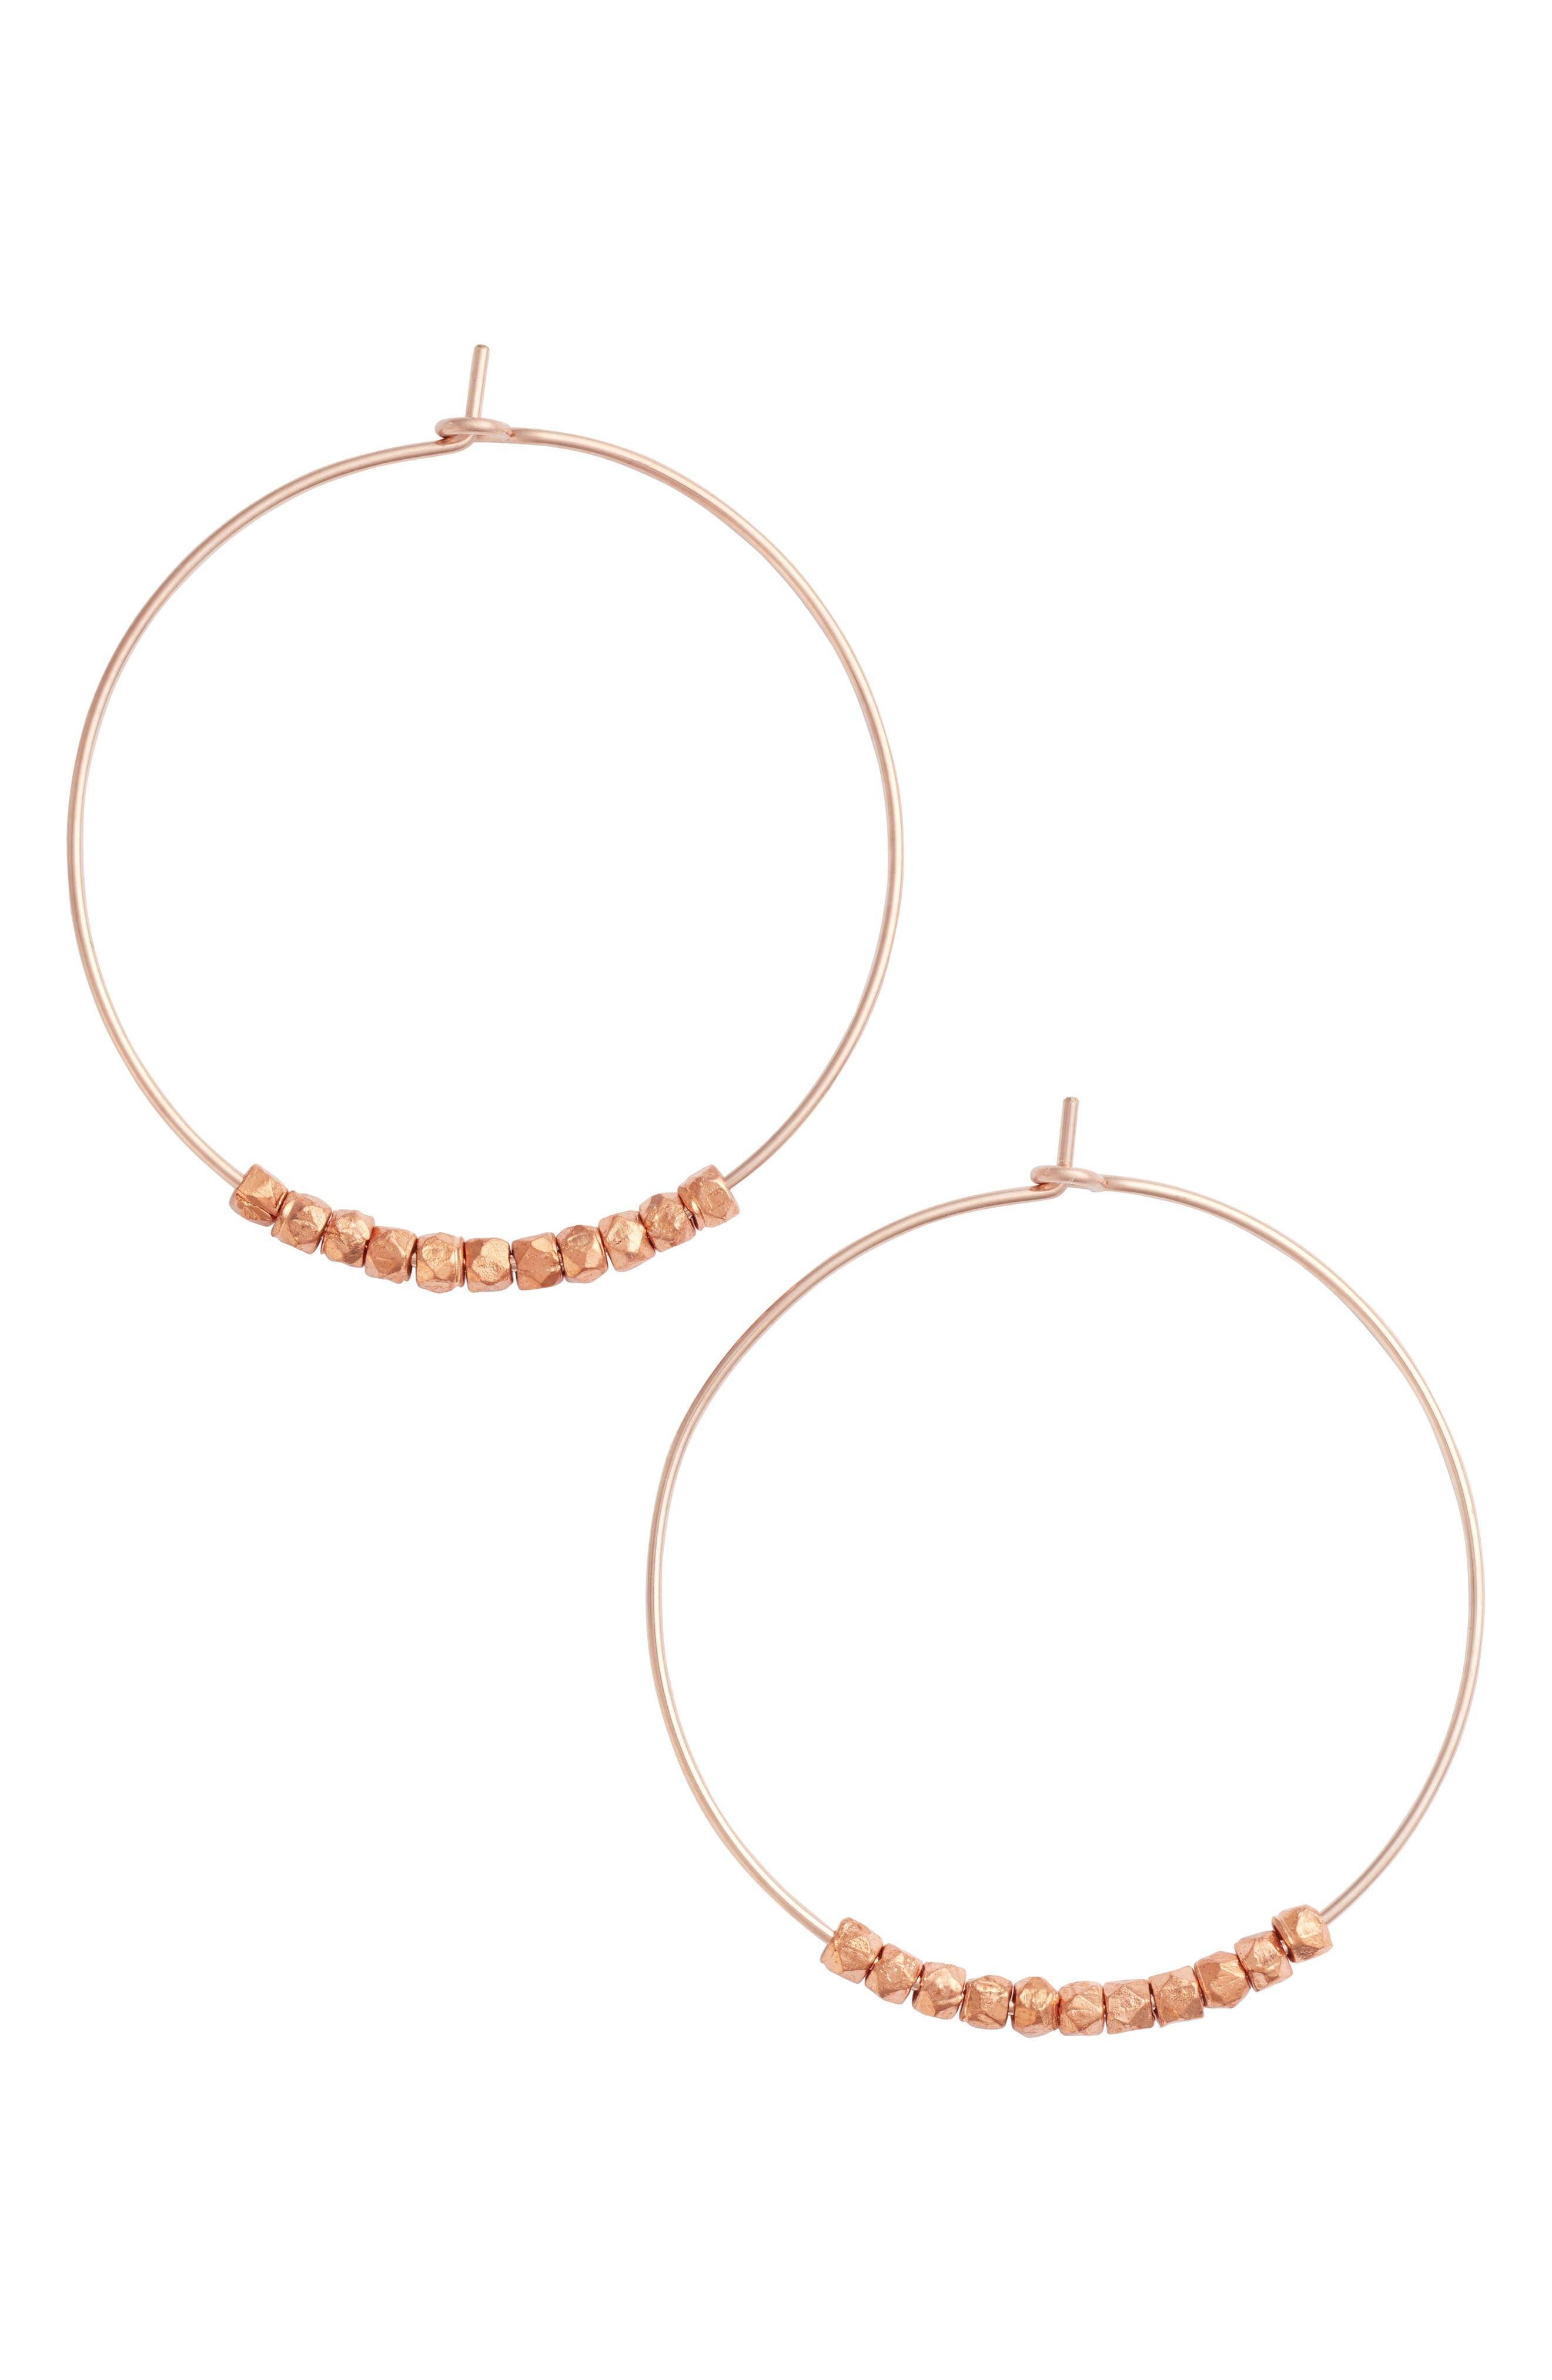 Main Image - Nashelle Karly Glistening Hoop Earrings